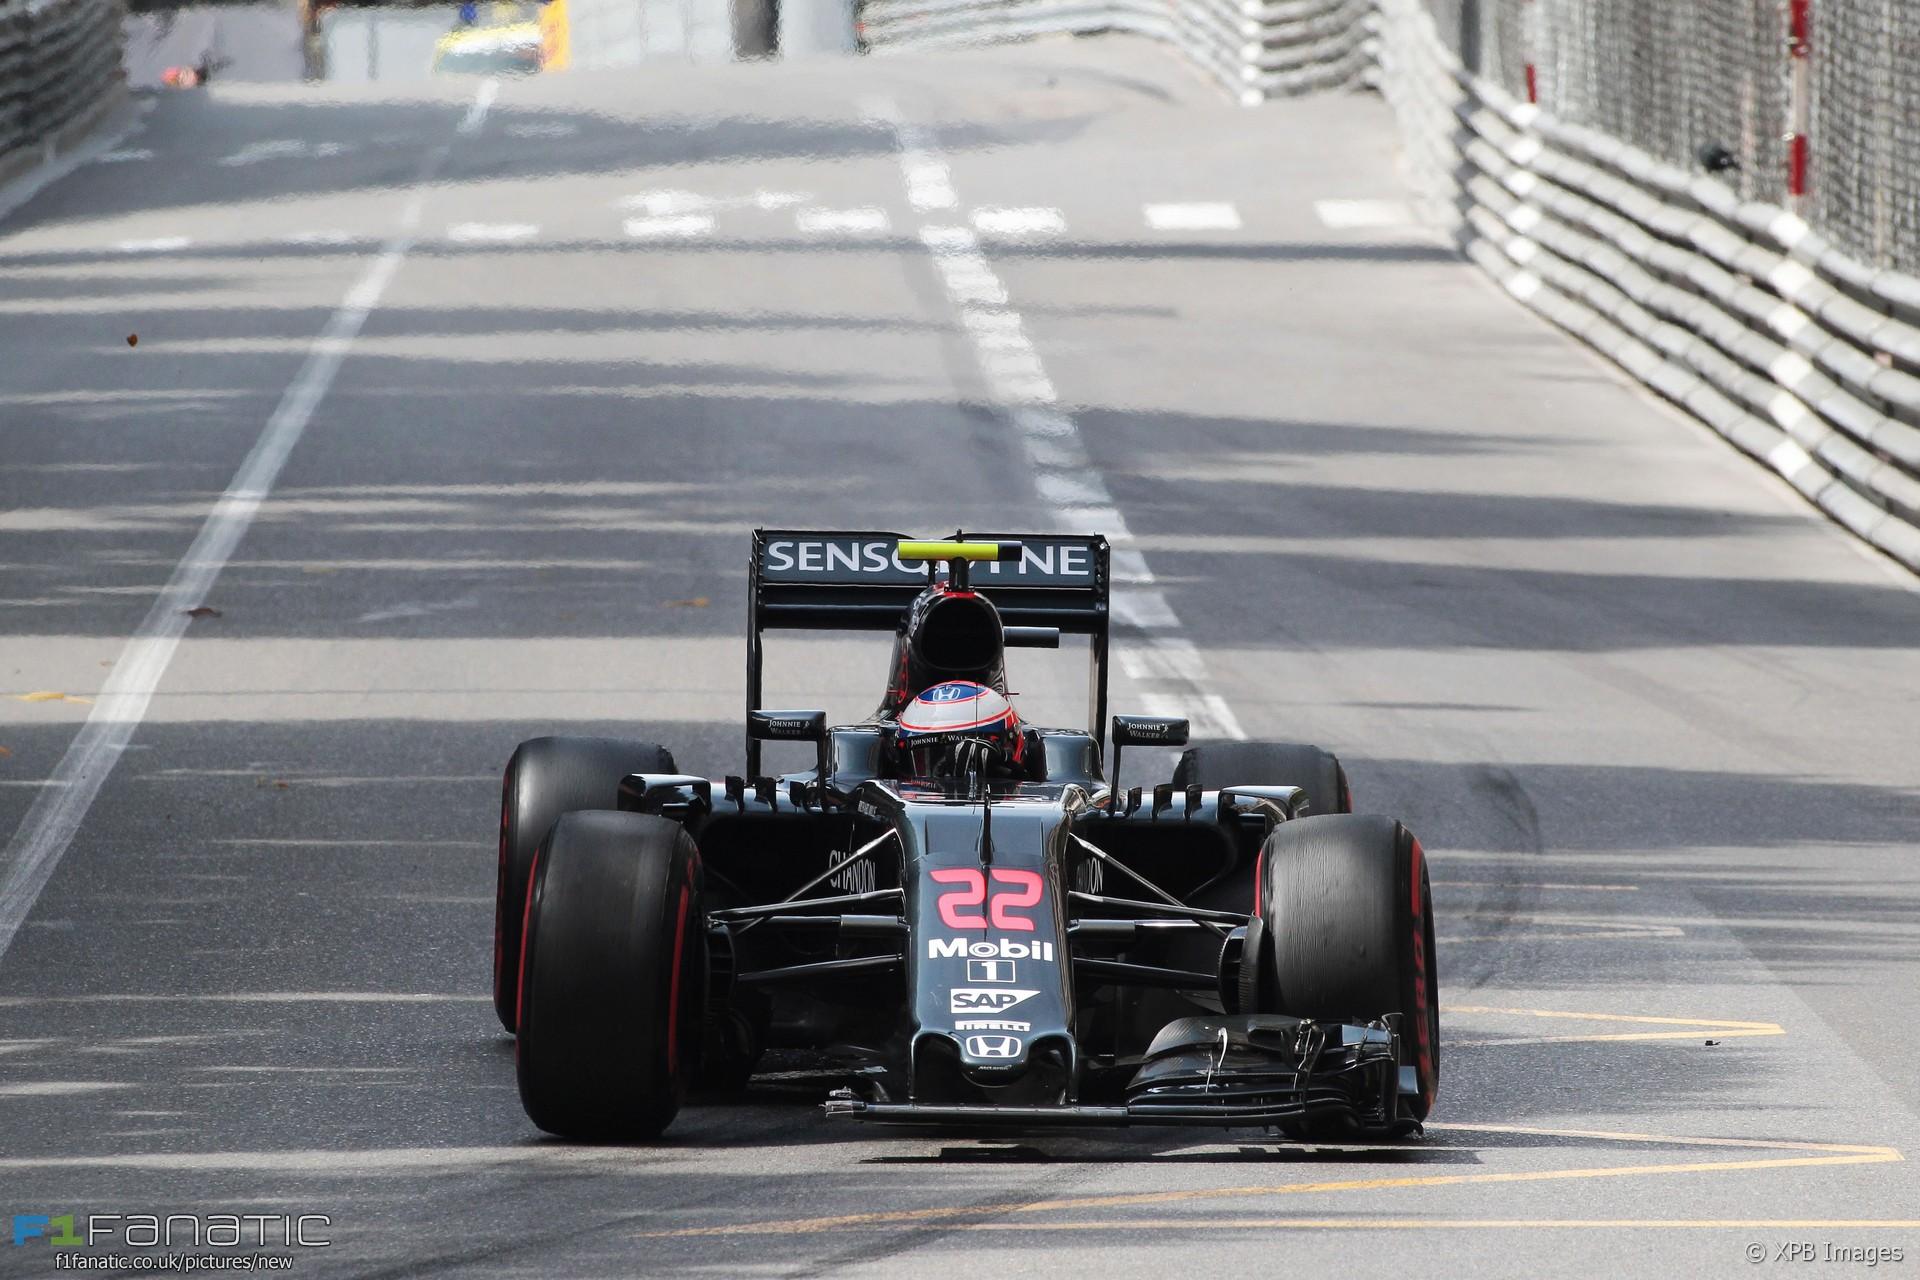 Jenson Button, McLaren, Monte-Carlo, 2016